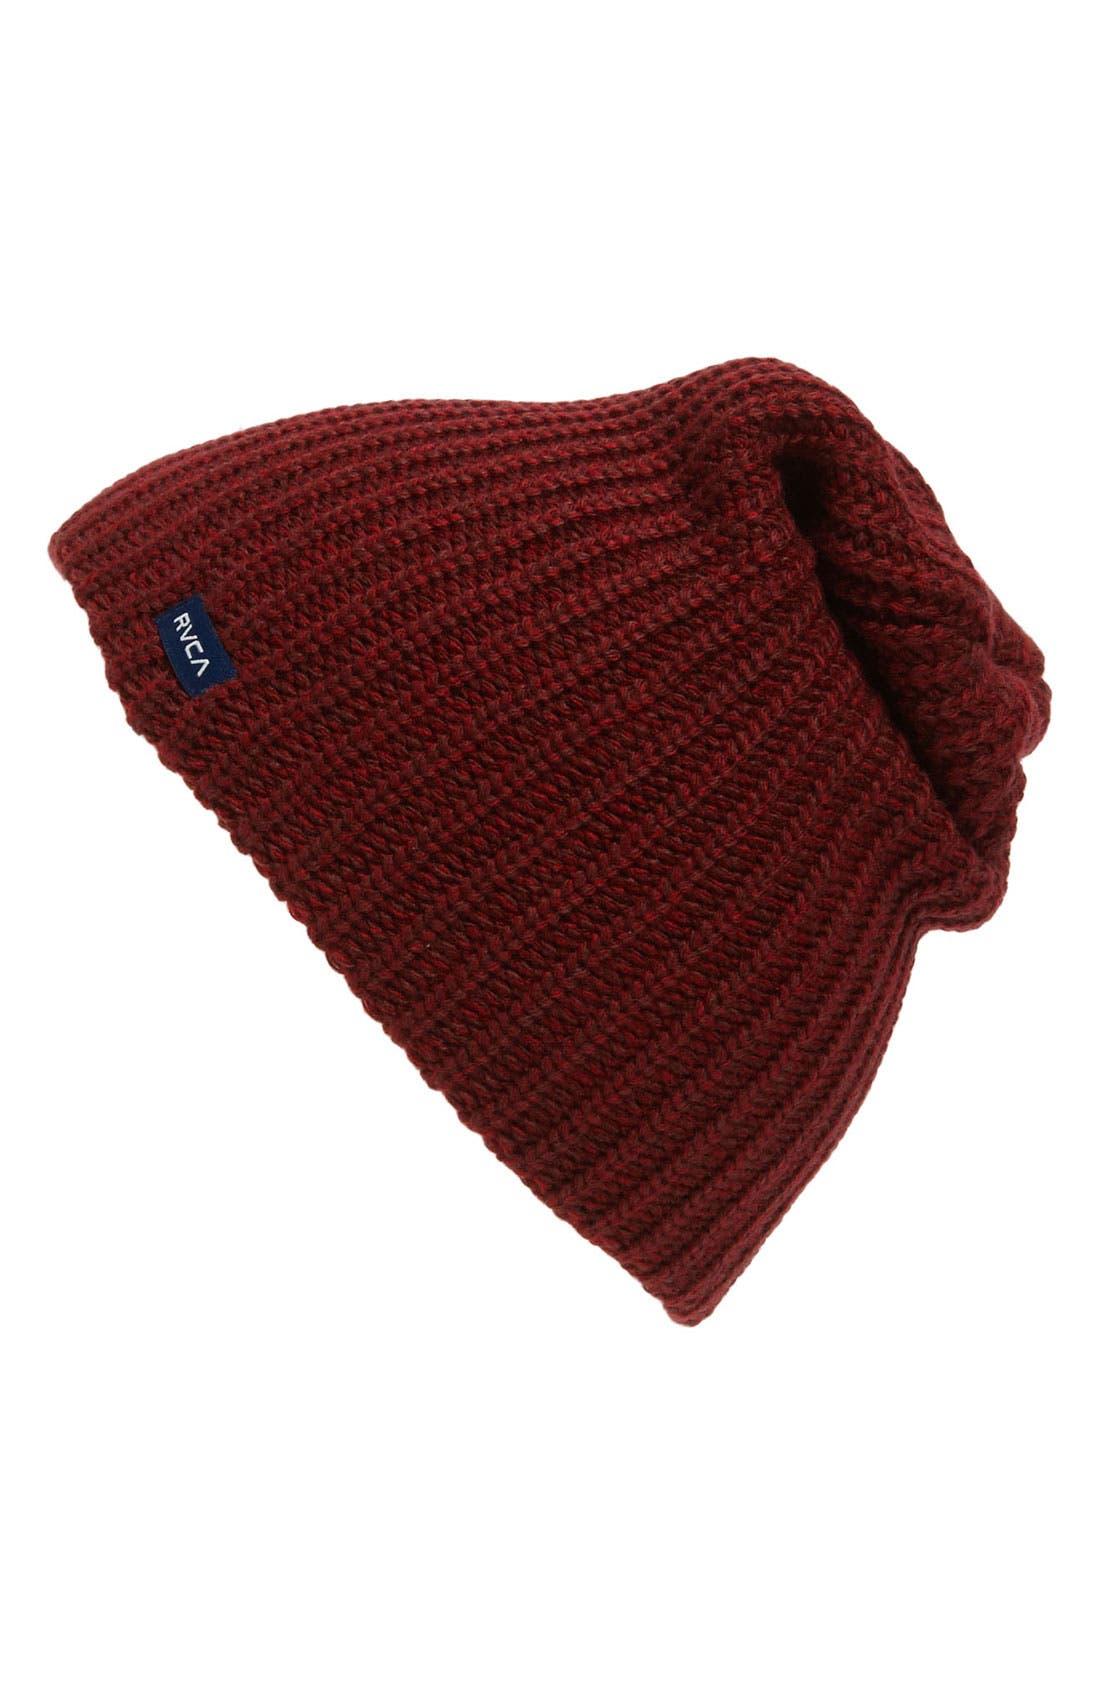 Main Image - RVCA 'Based' Knit Cap